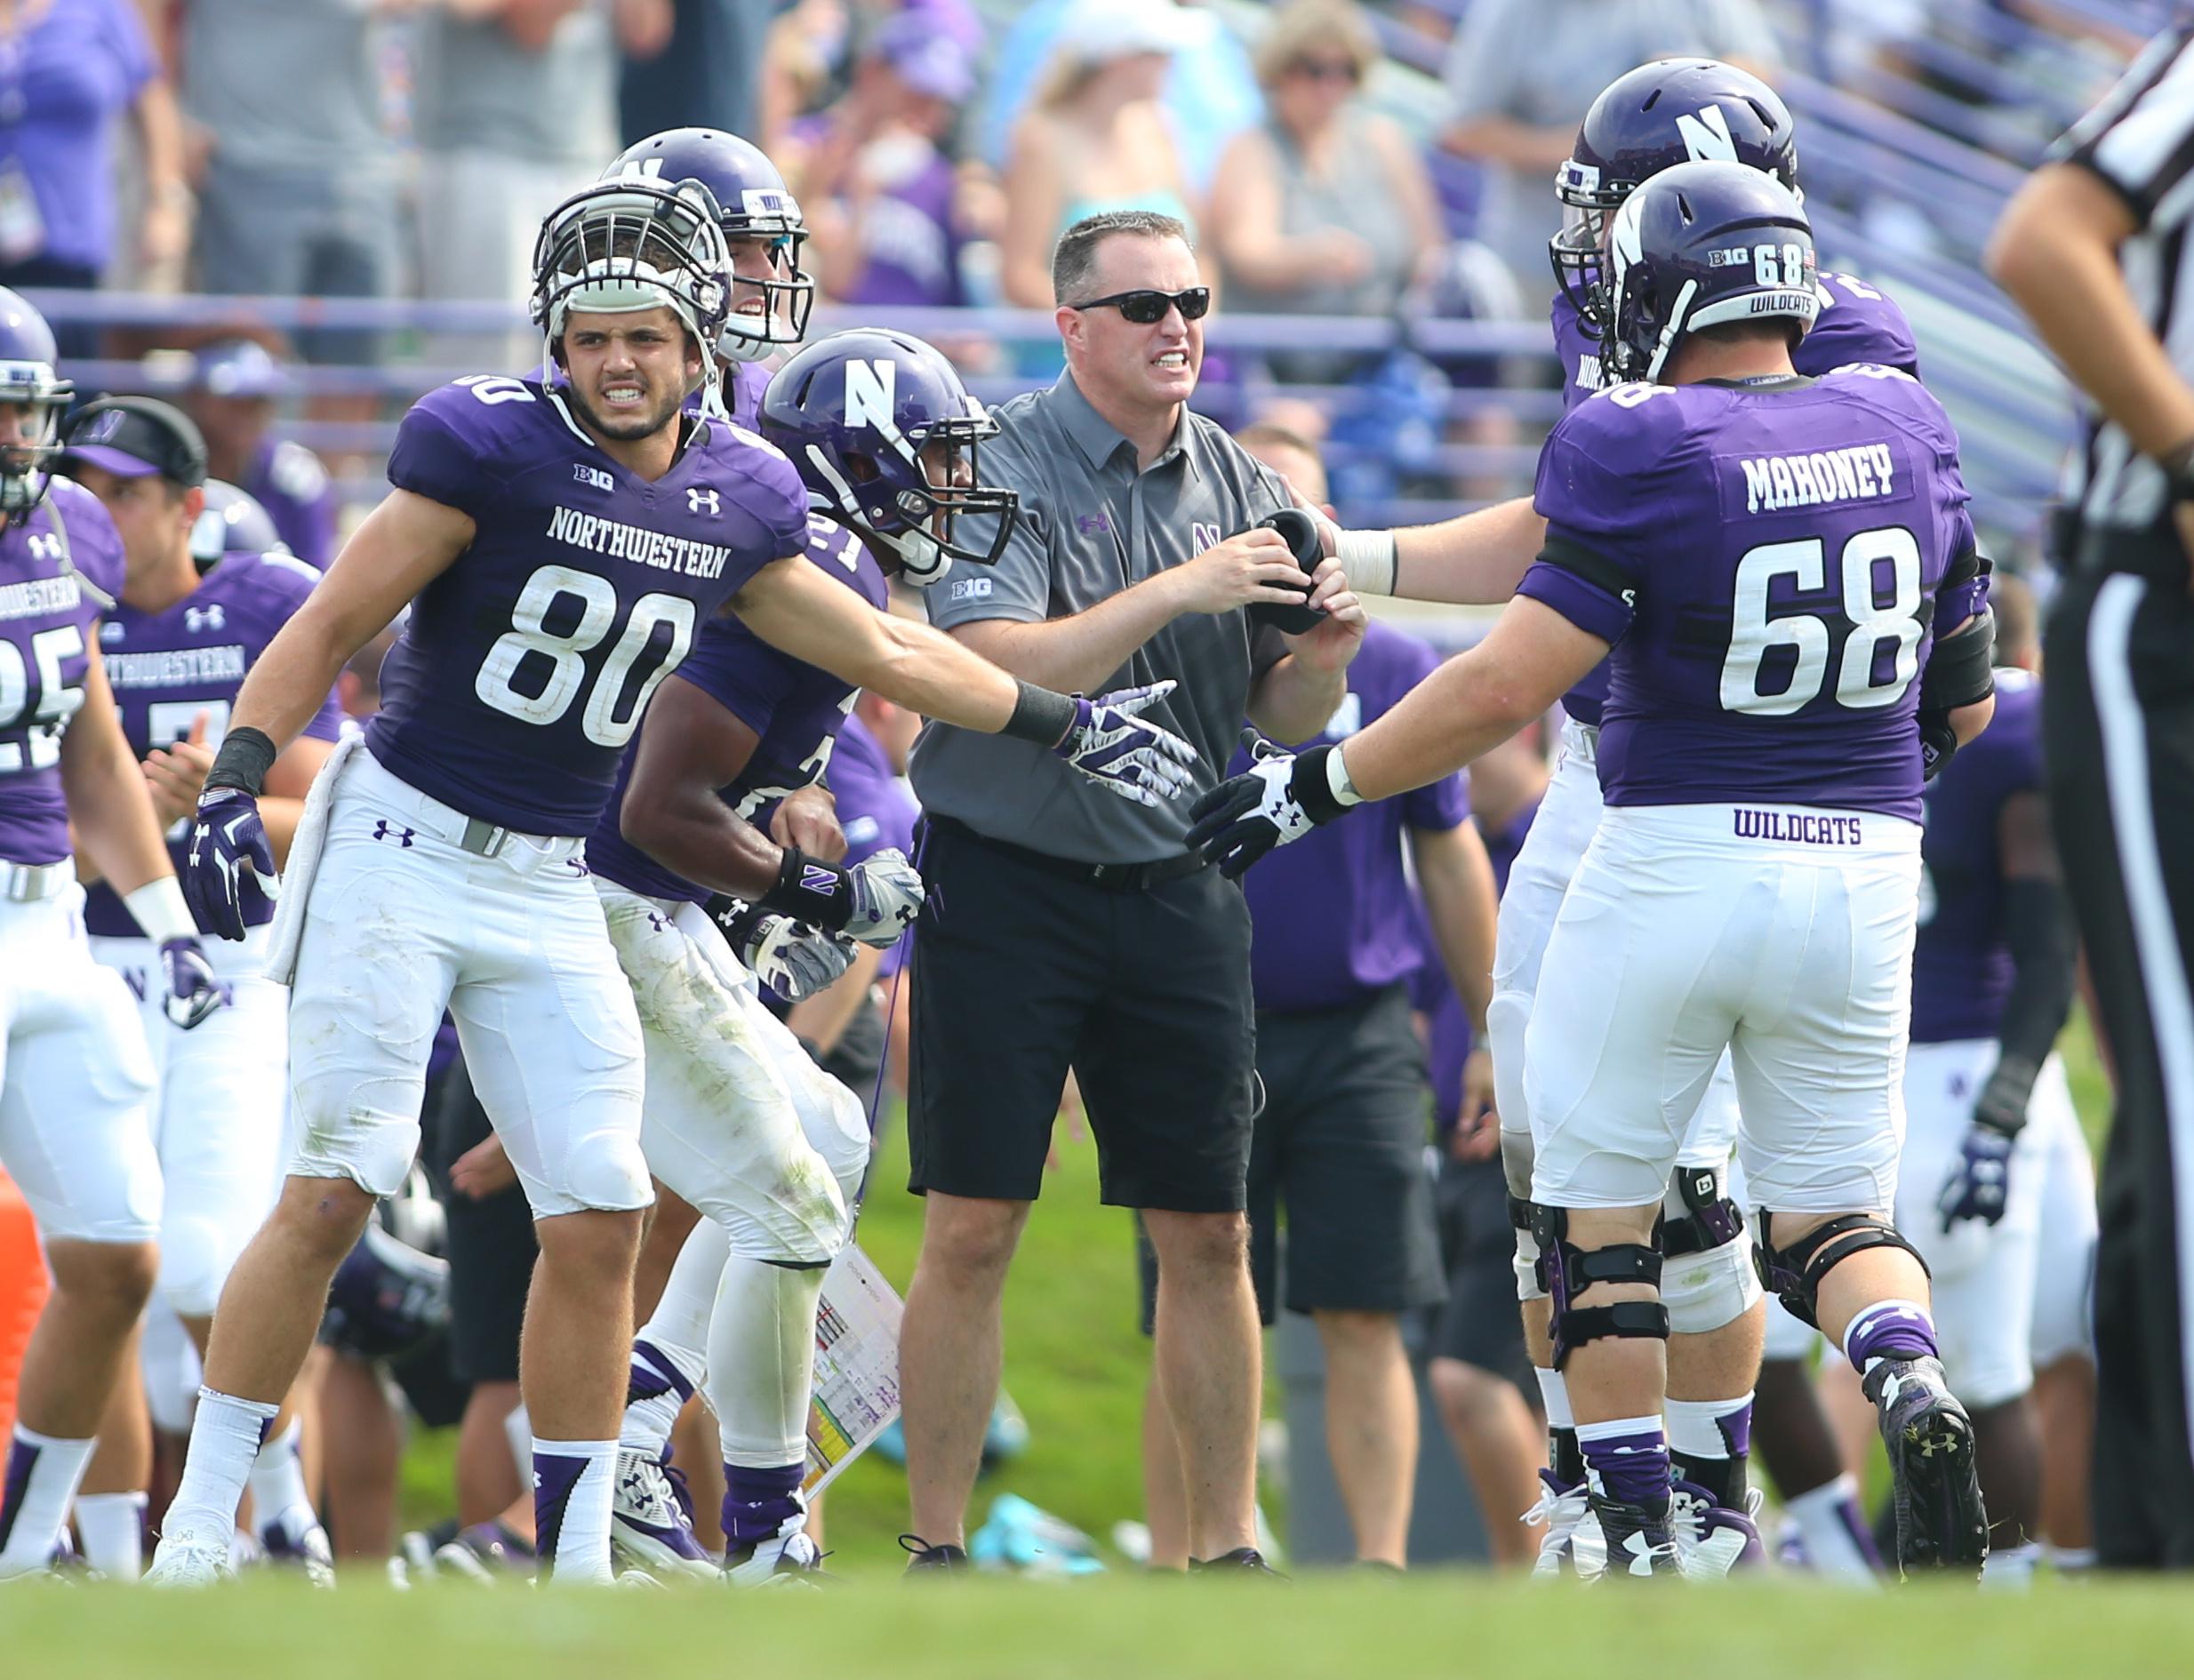 NCAA Football: Stanford at Northwestern